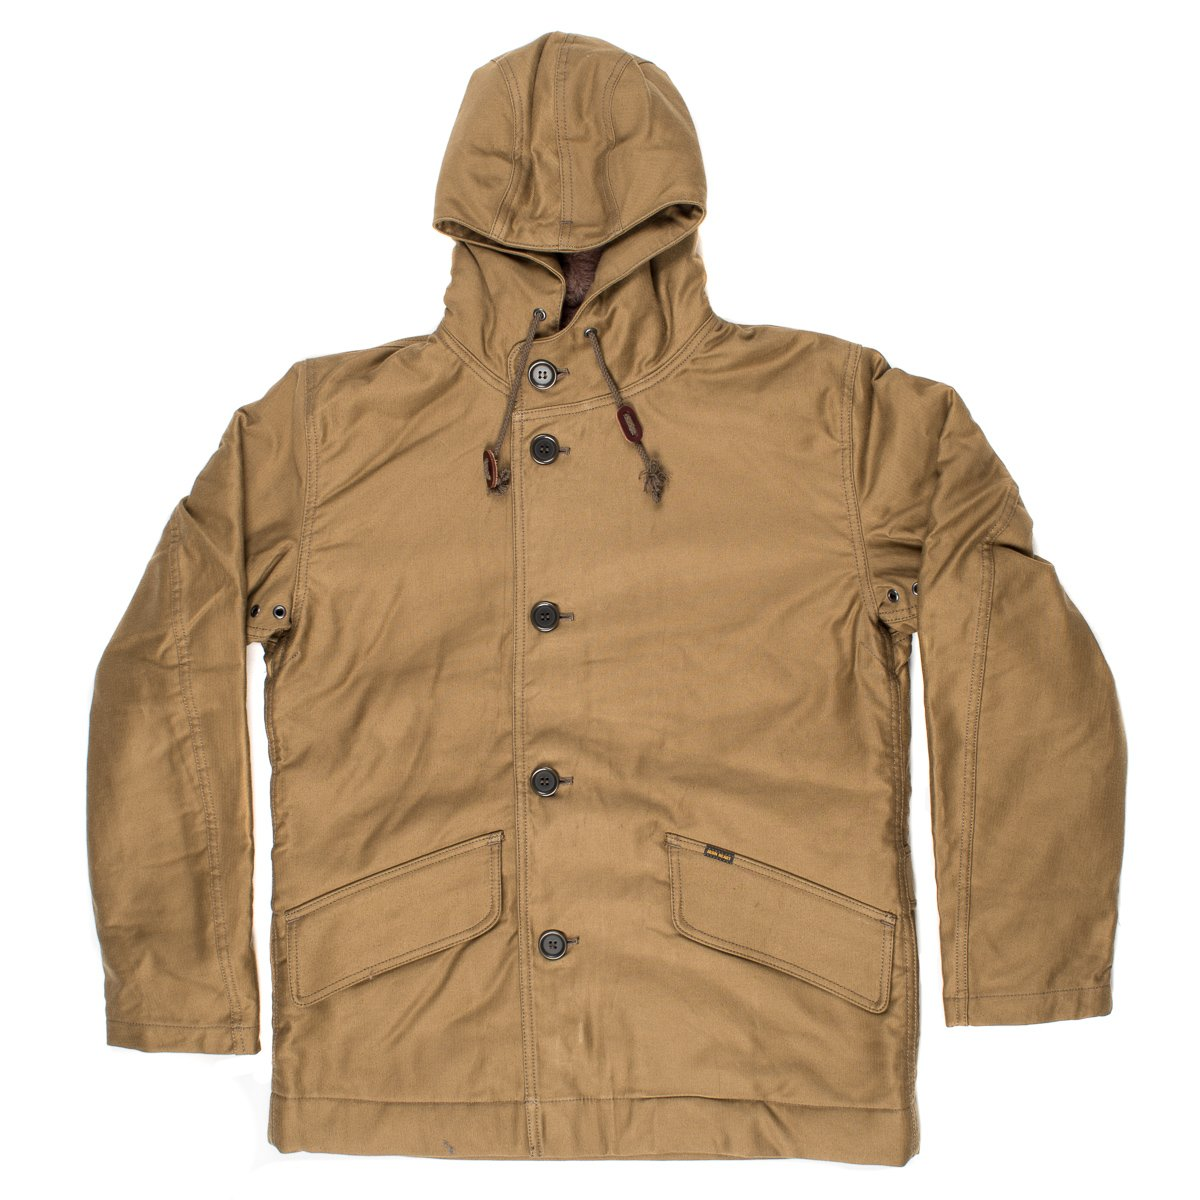 57b843046e8 Khaki Alpaca Lined Whipcord N1 Deck Half-Coat